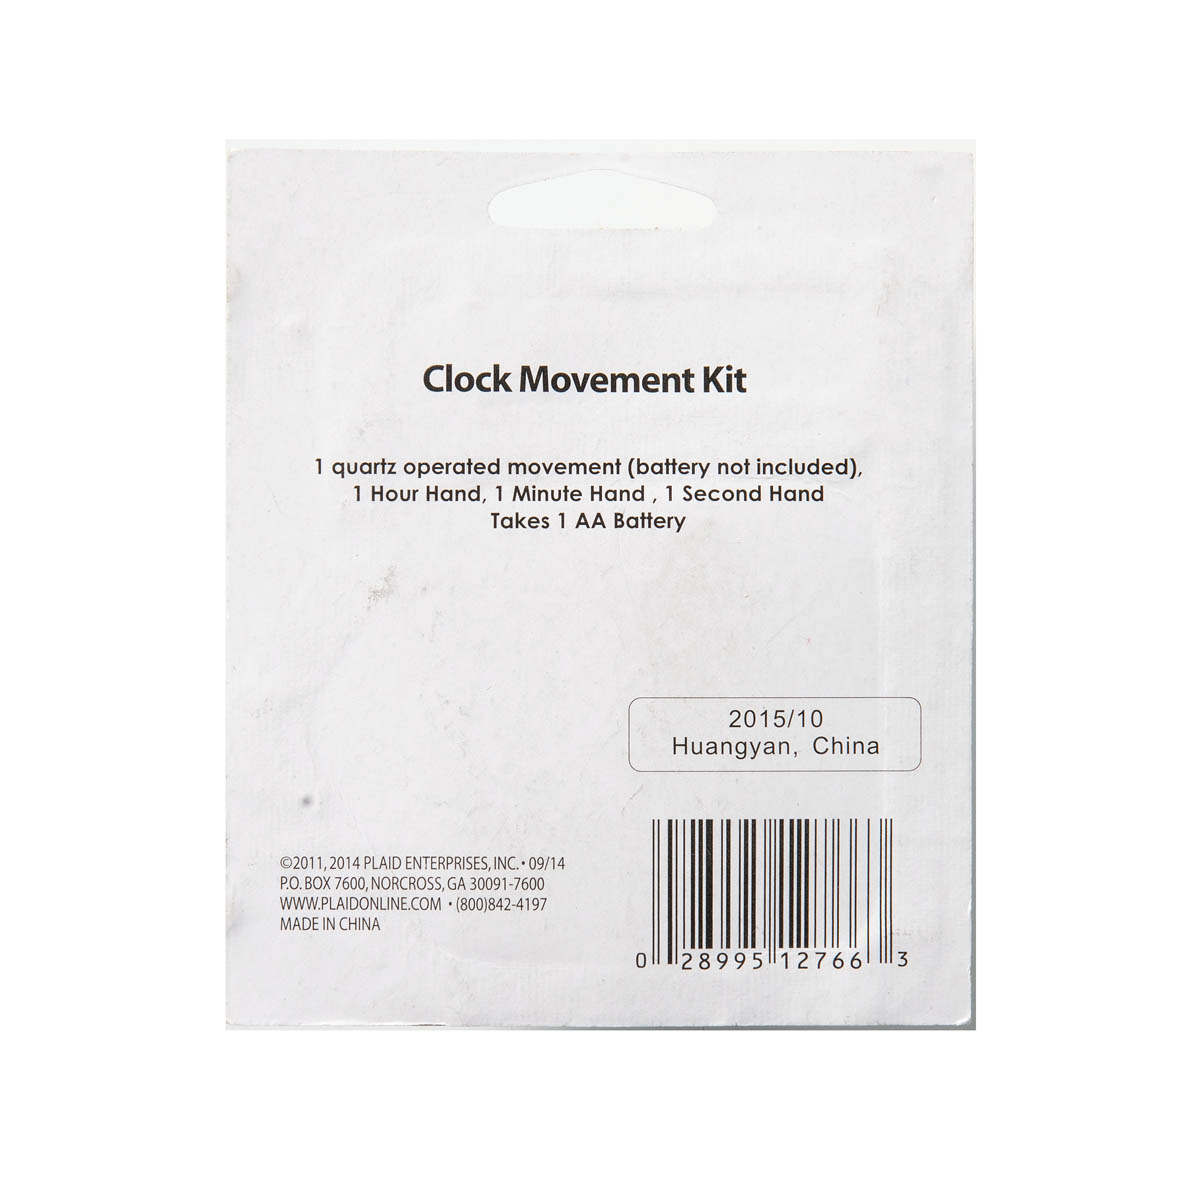 Plaid ® Accessories - Clock Movement Kit, 4 pieces - 12766